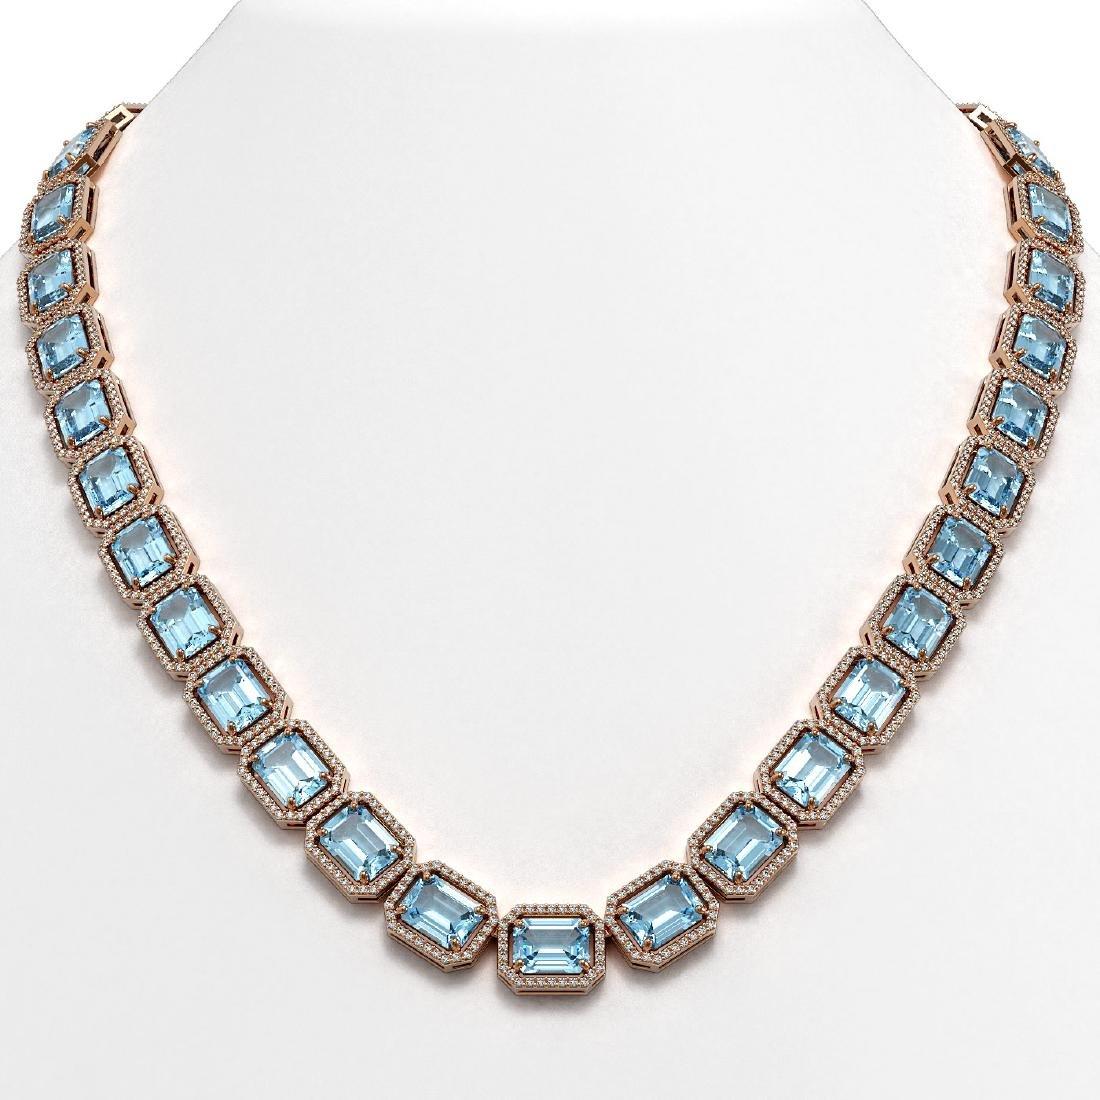 80.98 CTW Aquamarine & Diamond Halo Necklace 10K Rose